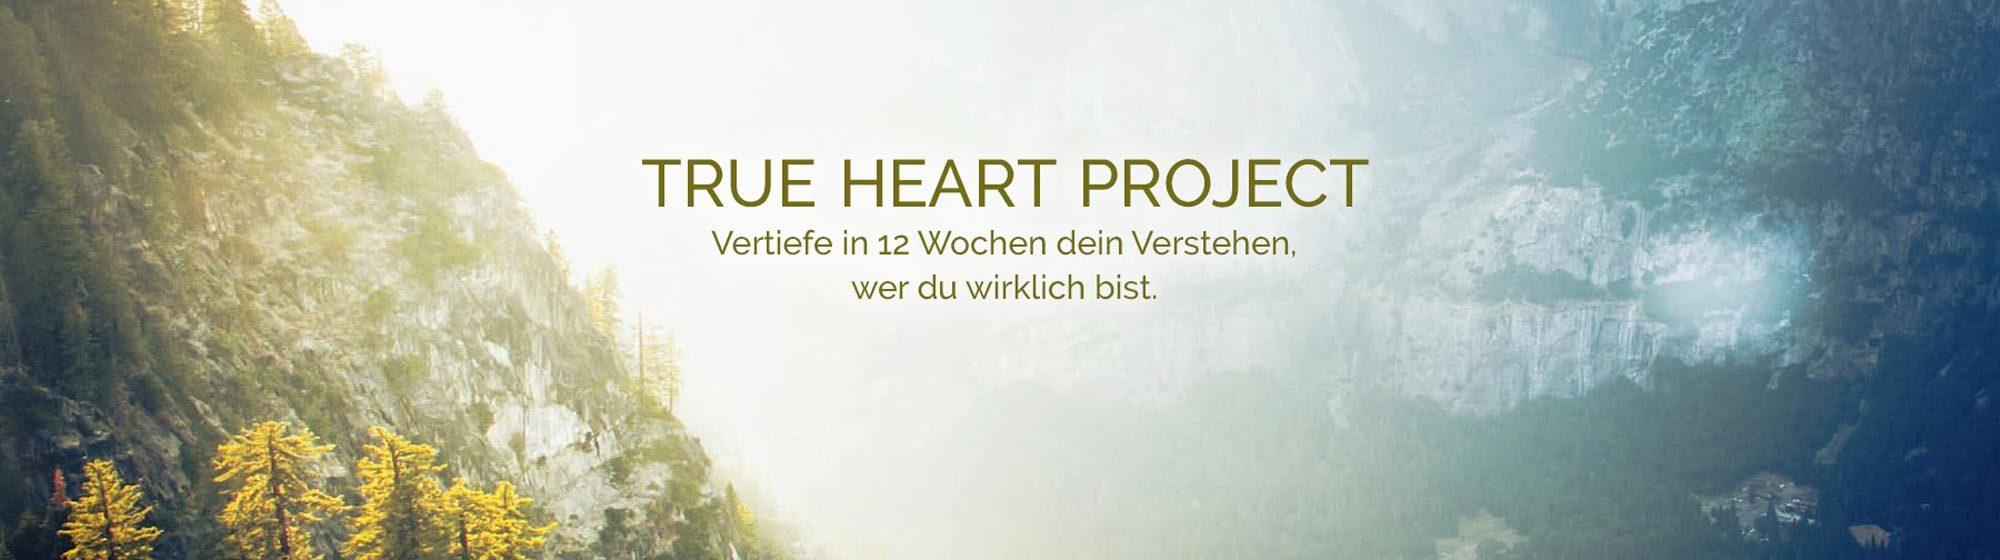 True_heart_project_banner1_2000x560